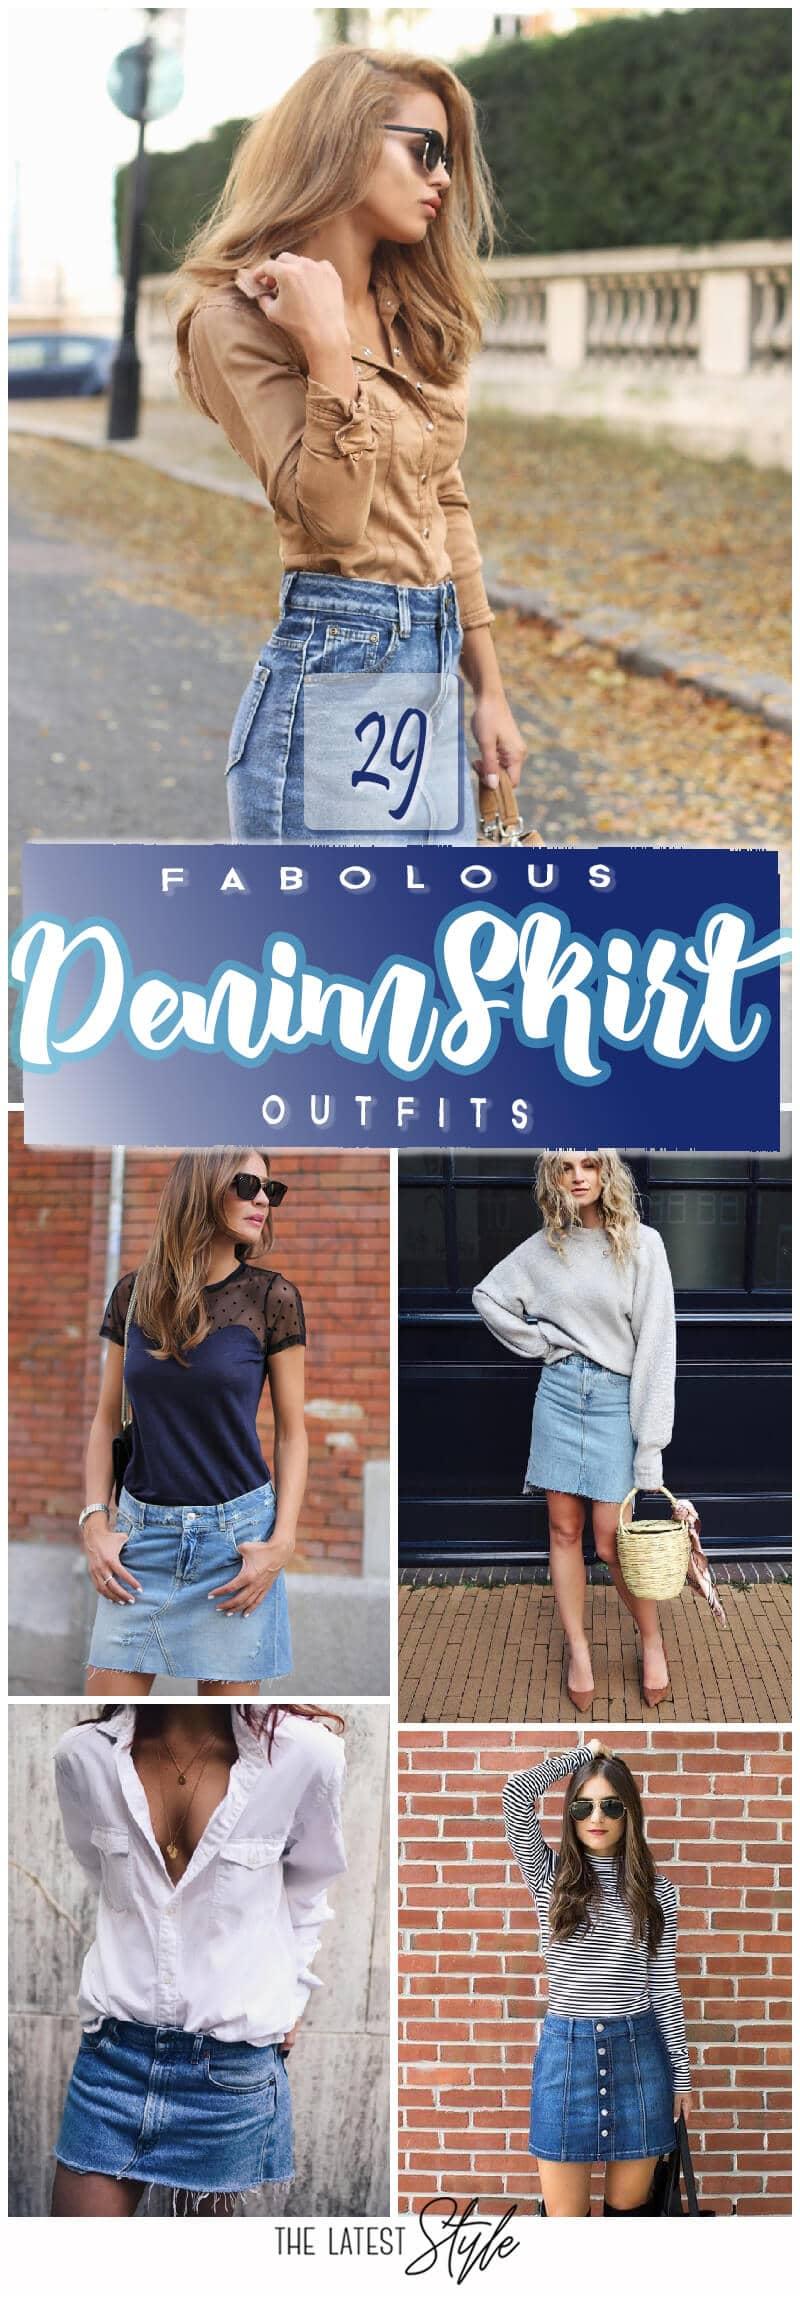 29 Fabolous Denim Skirt Outfits For This Autumn